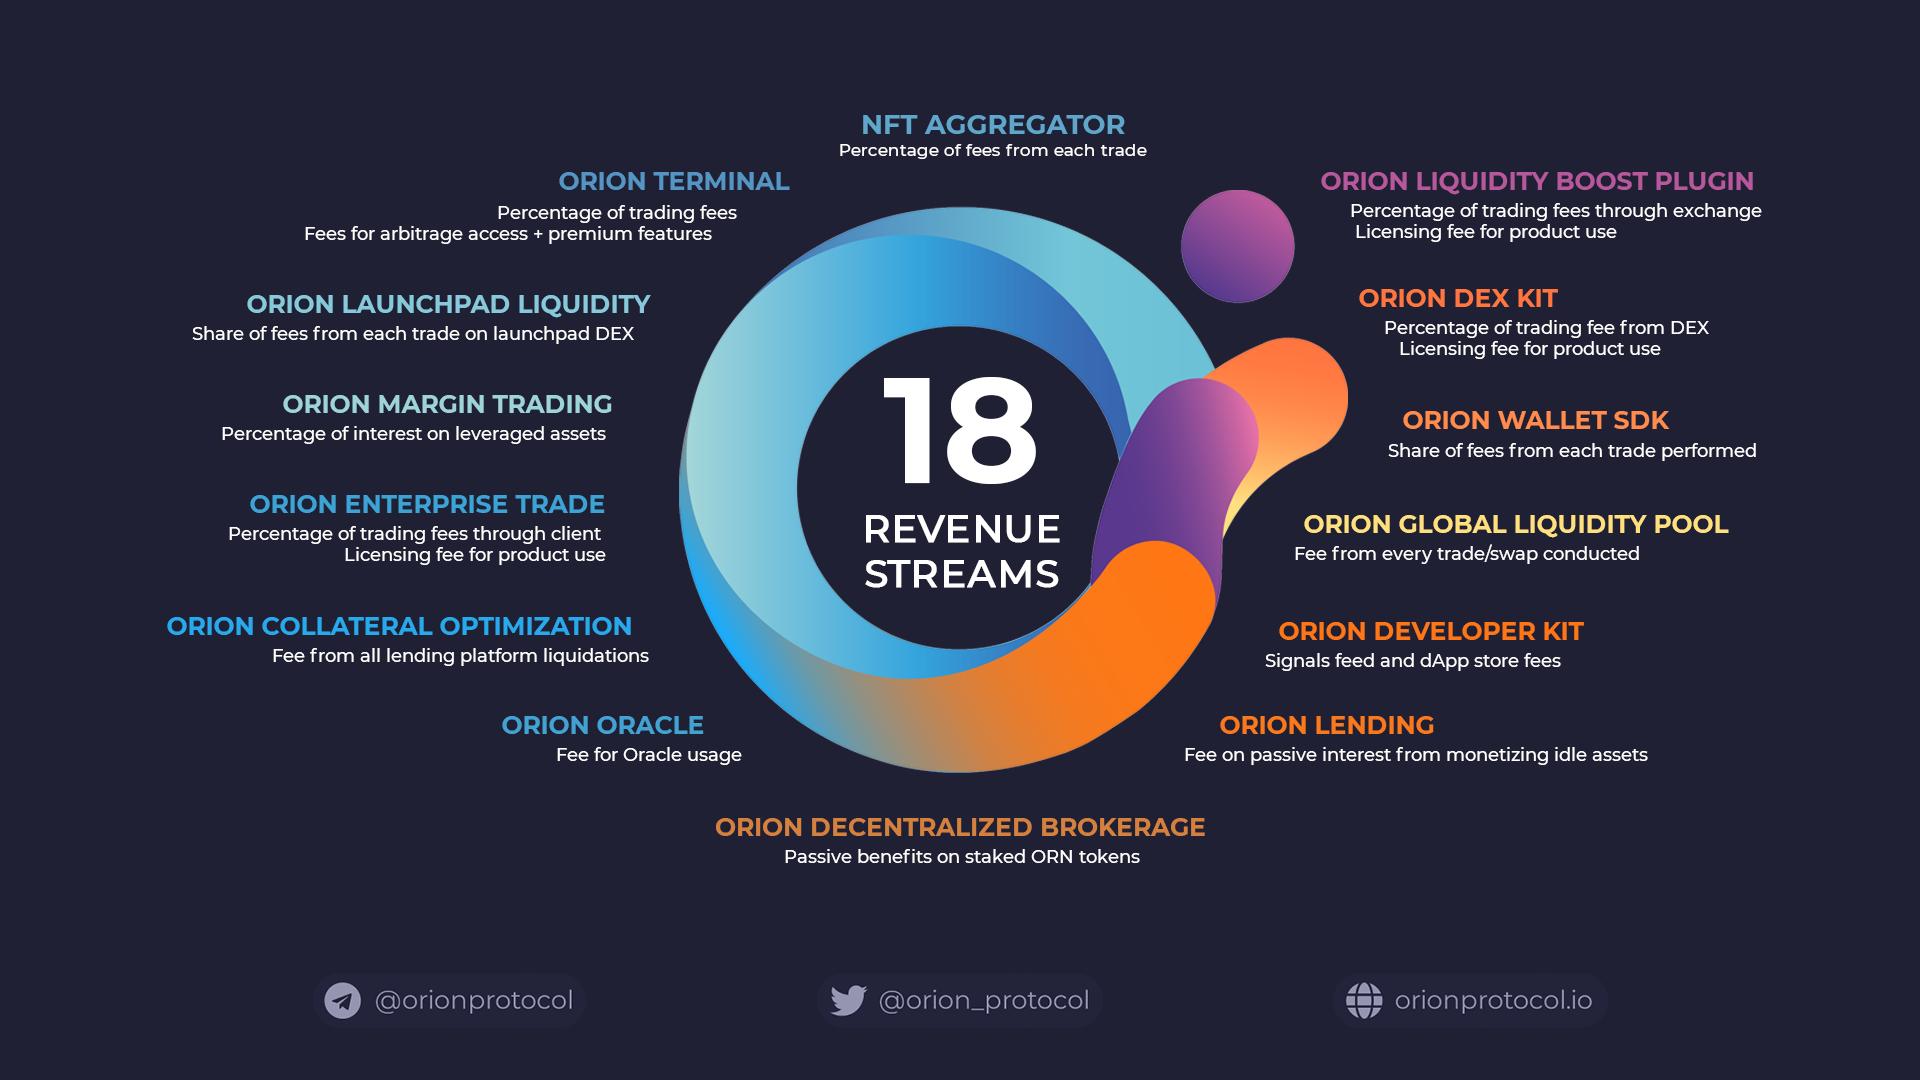 Orion's Revenue Streams